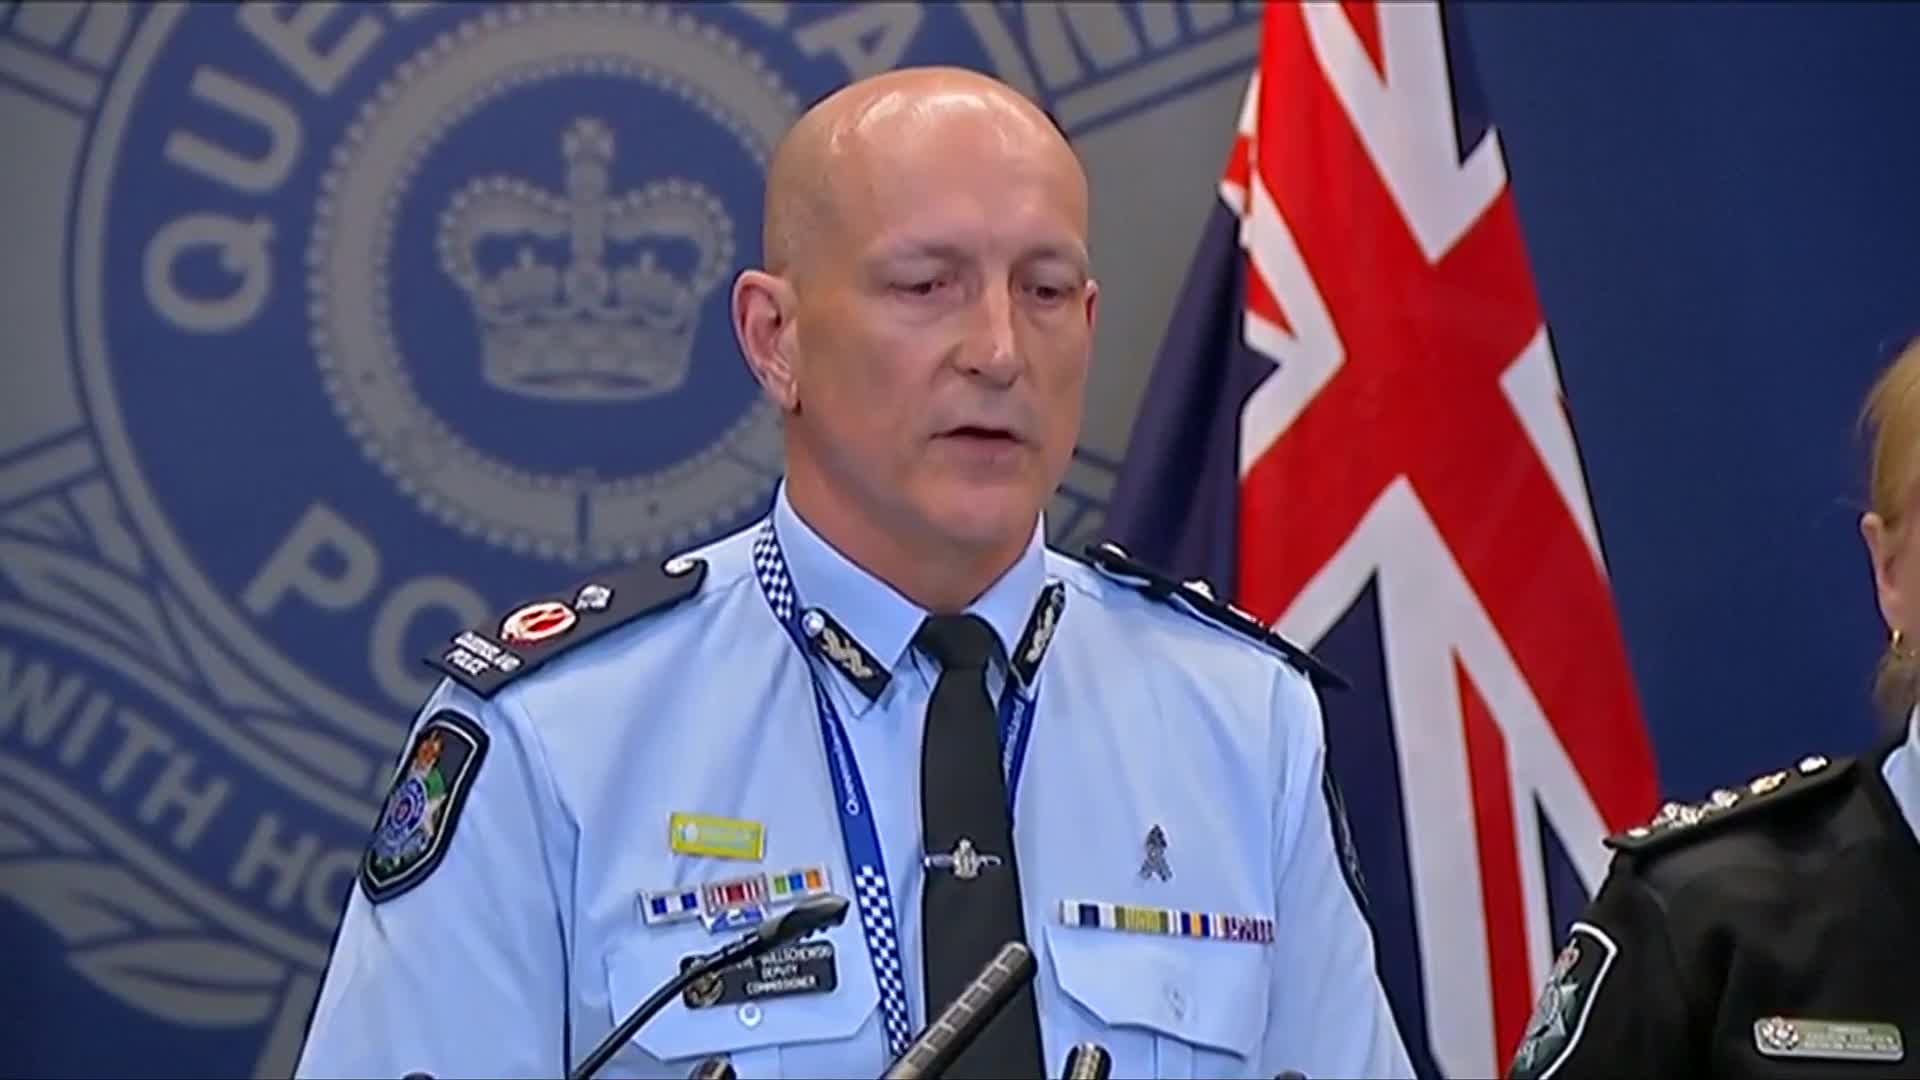 British woman killed in Australia hostel attack